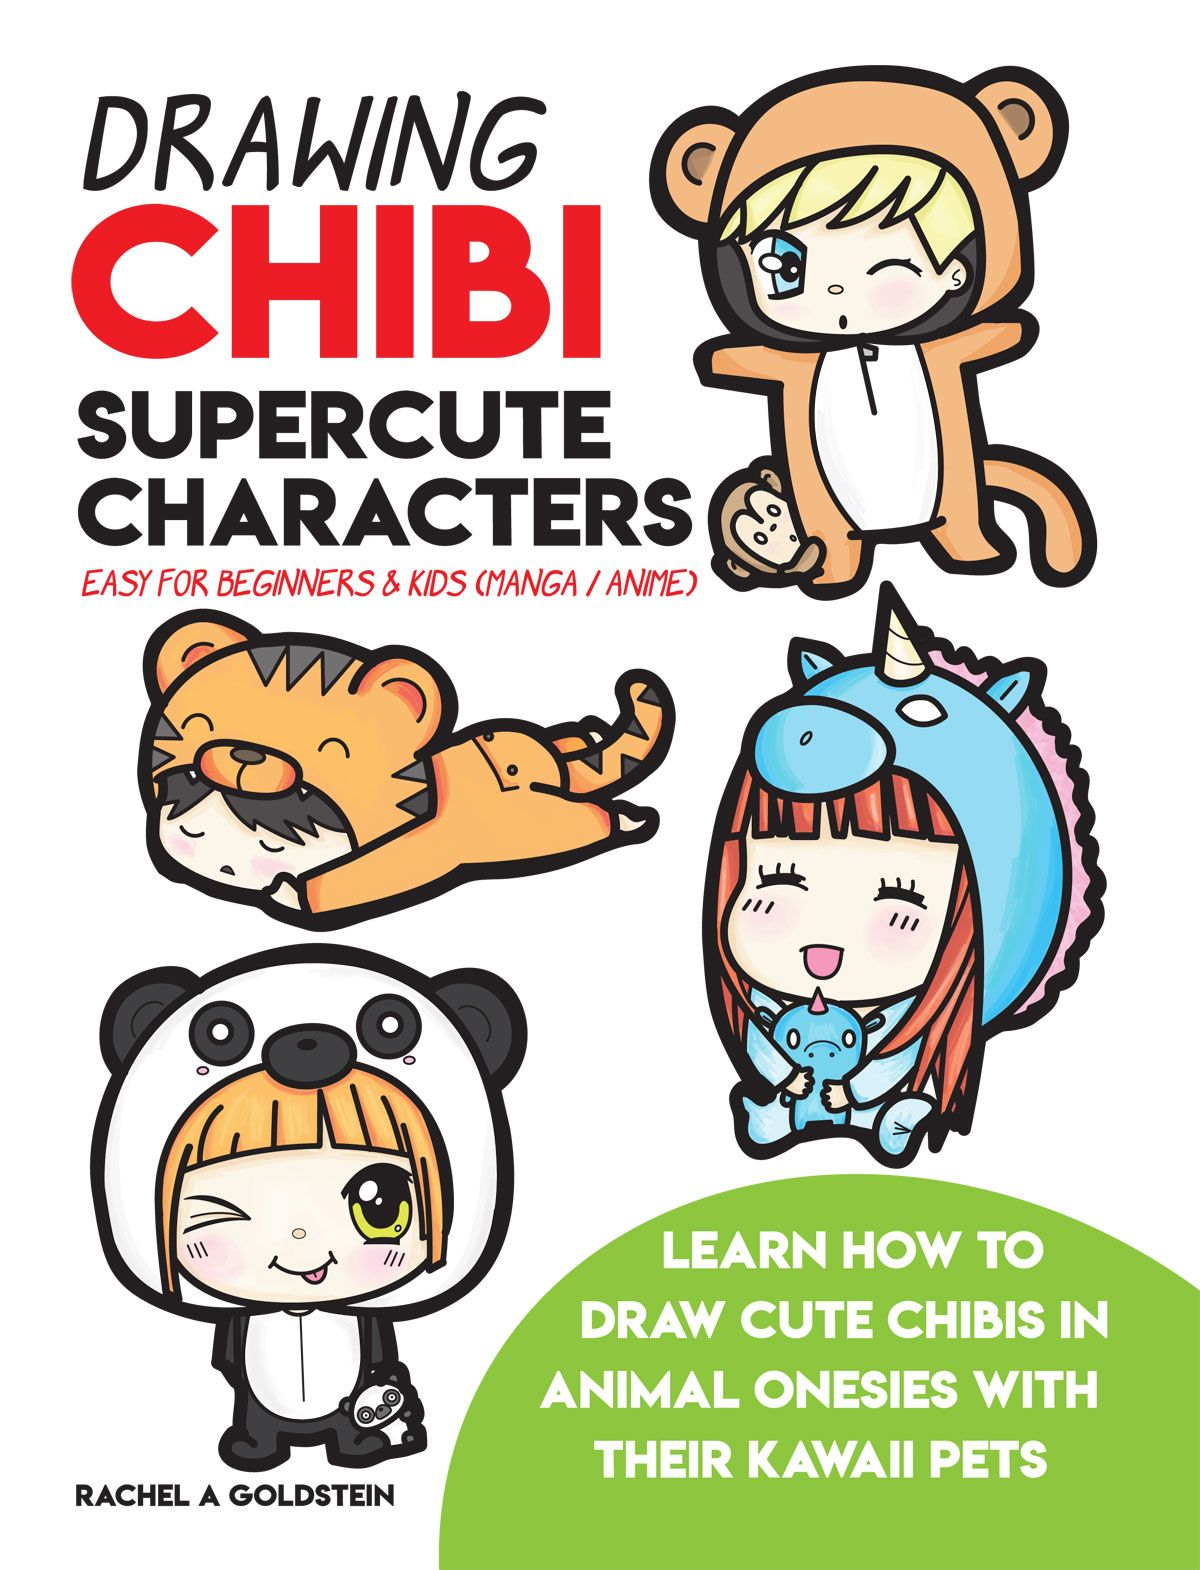 Drawing supercute chibis in animal pajamas for beginners